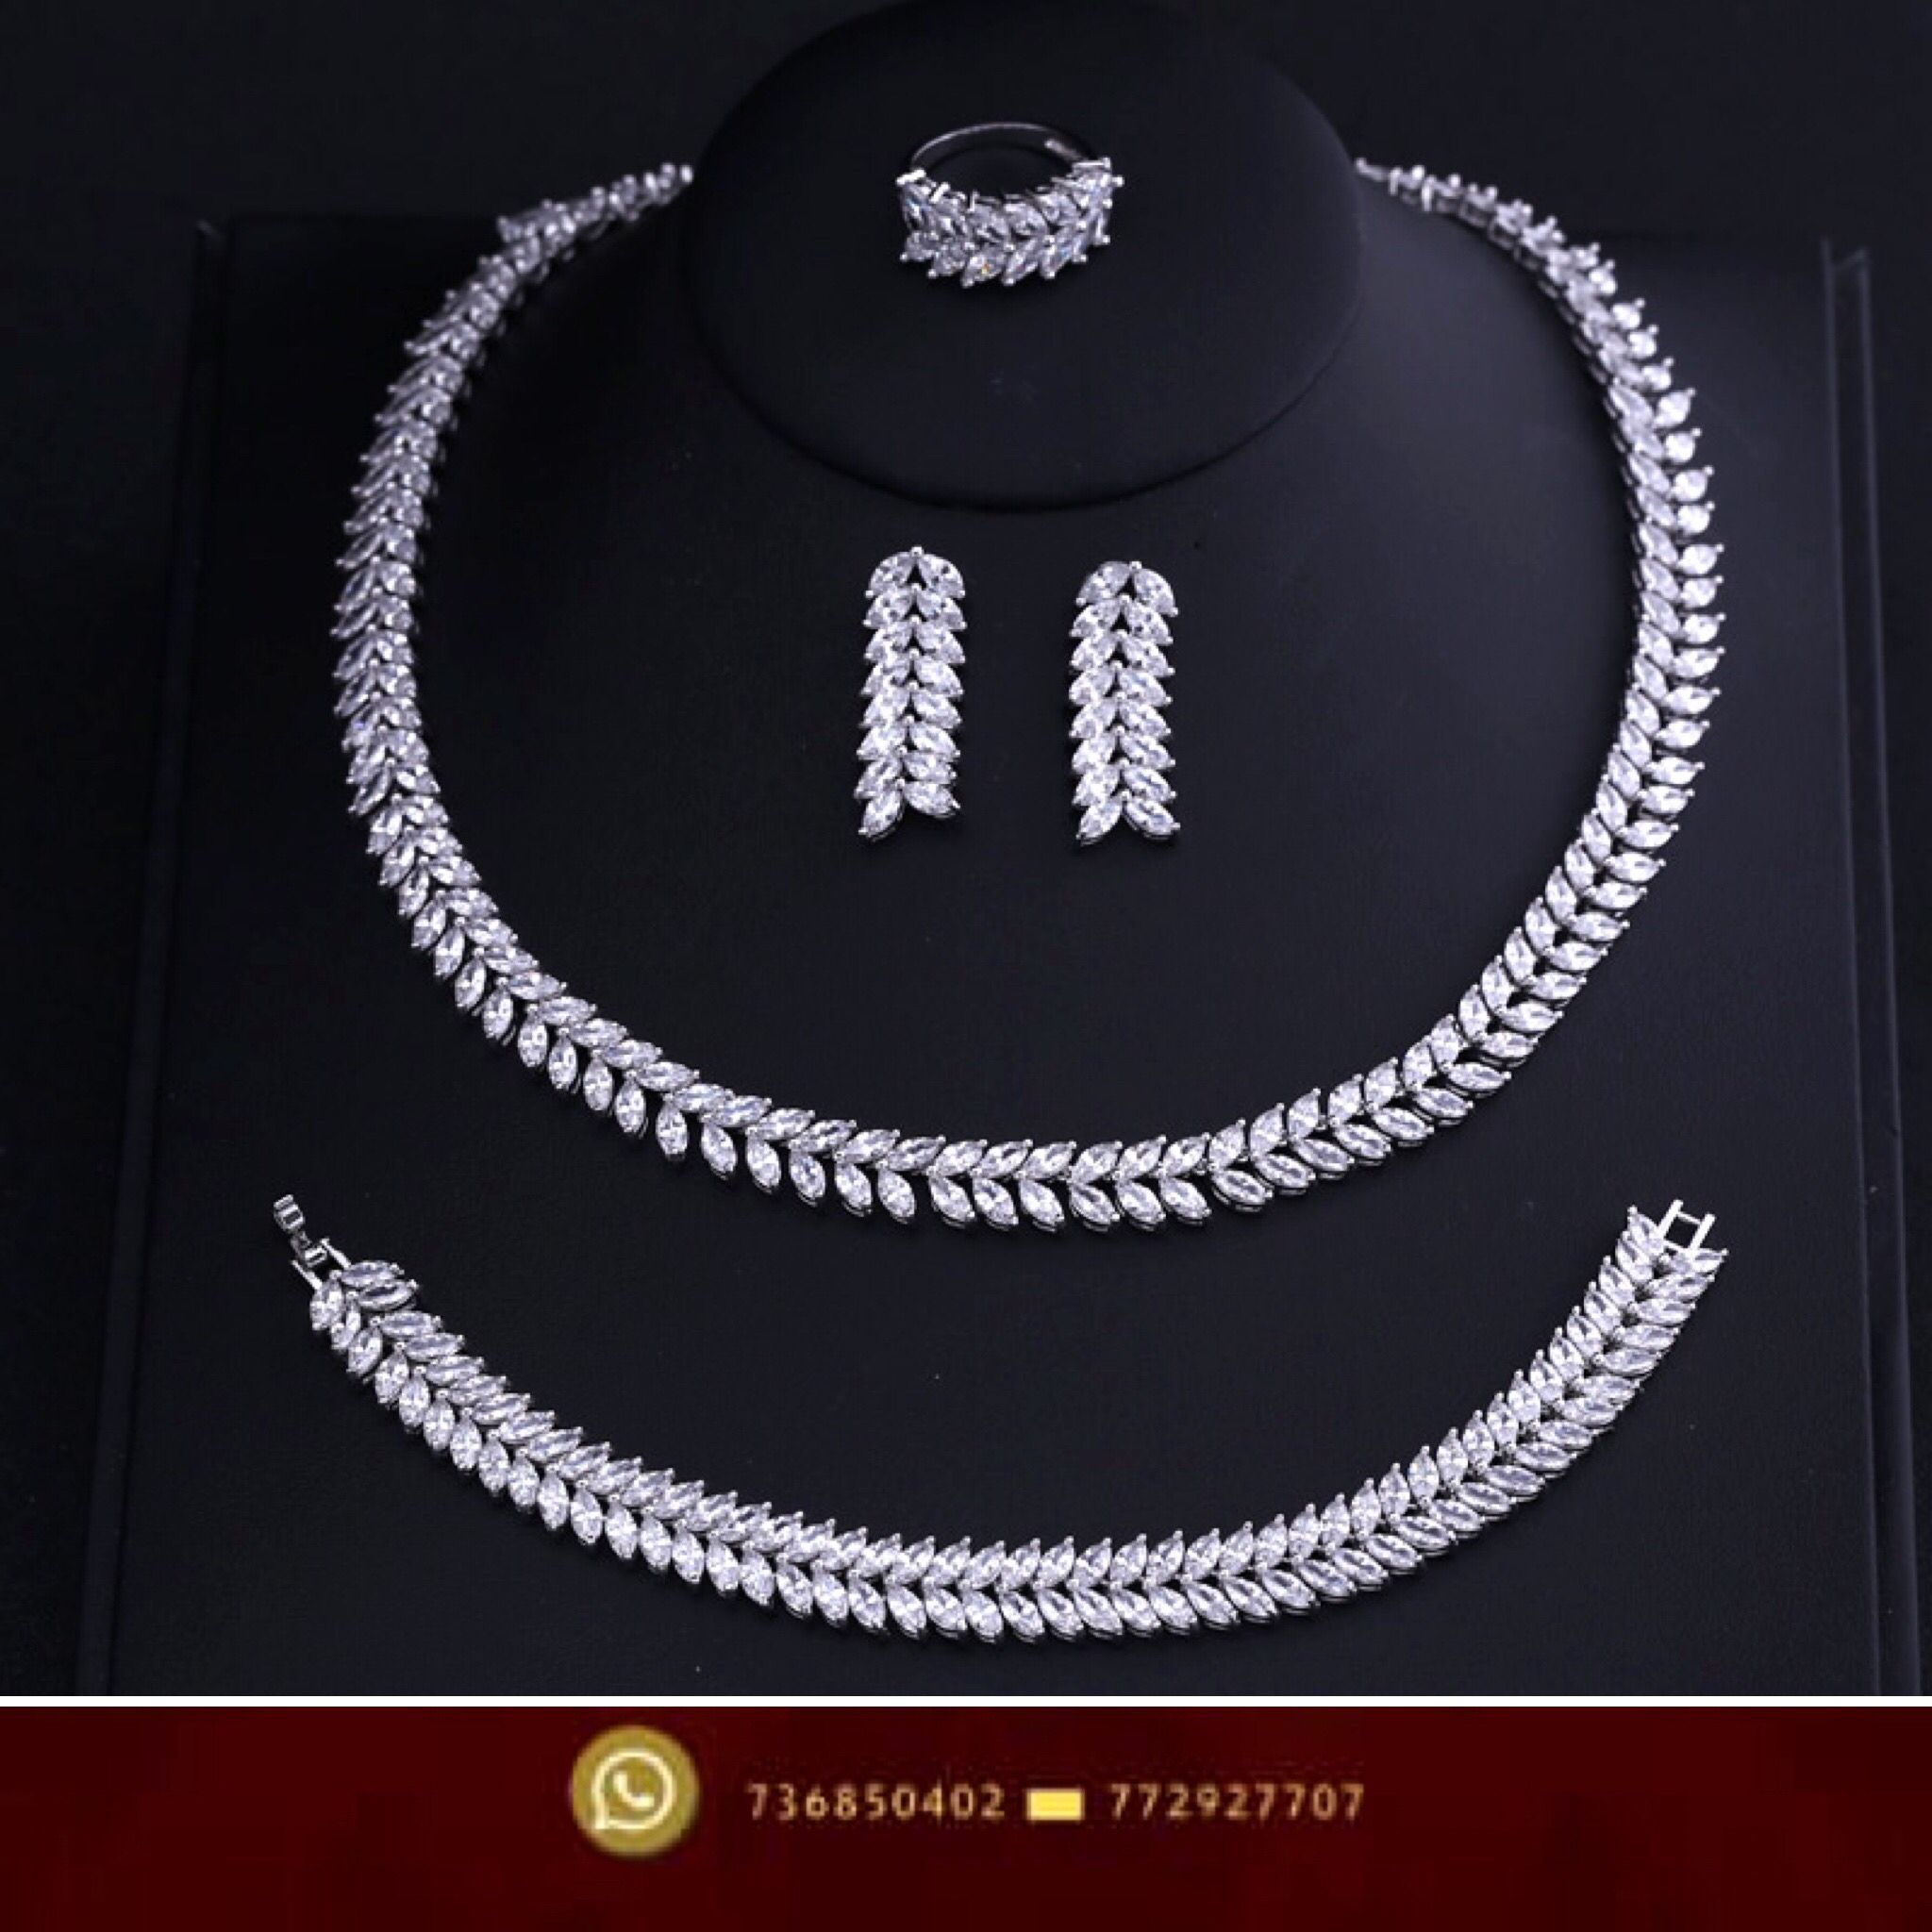 اطقم نسائي صنعاء اليمن فضة زركون بيع Diamond Necklace Diamond Necklace